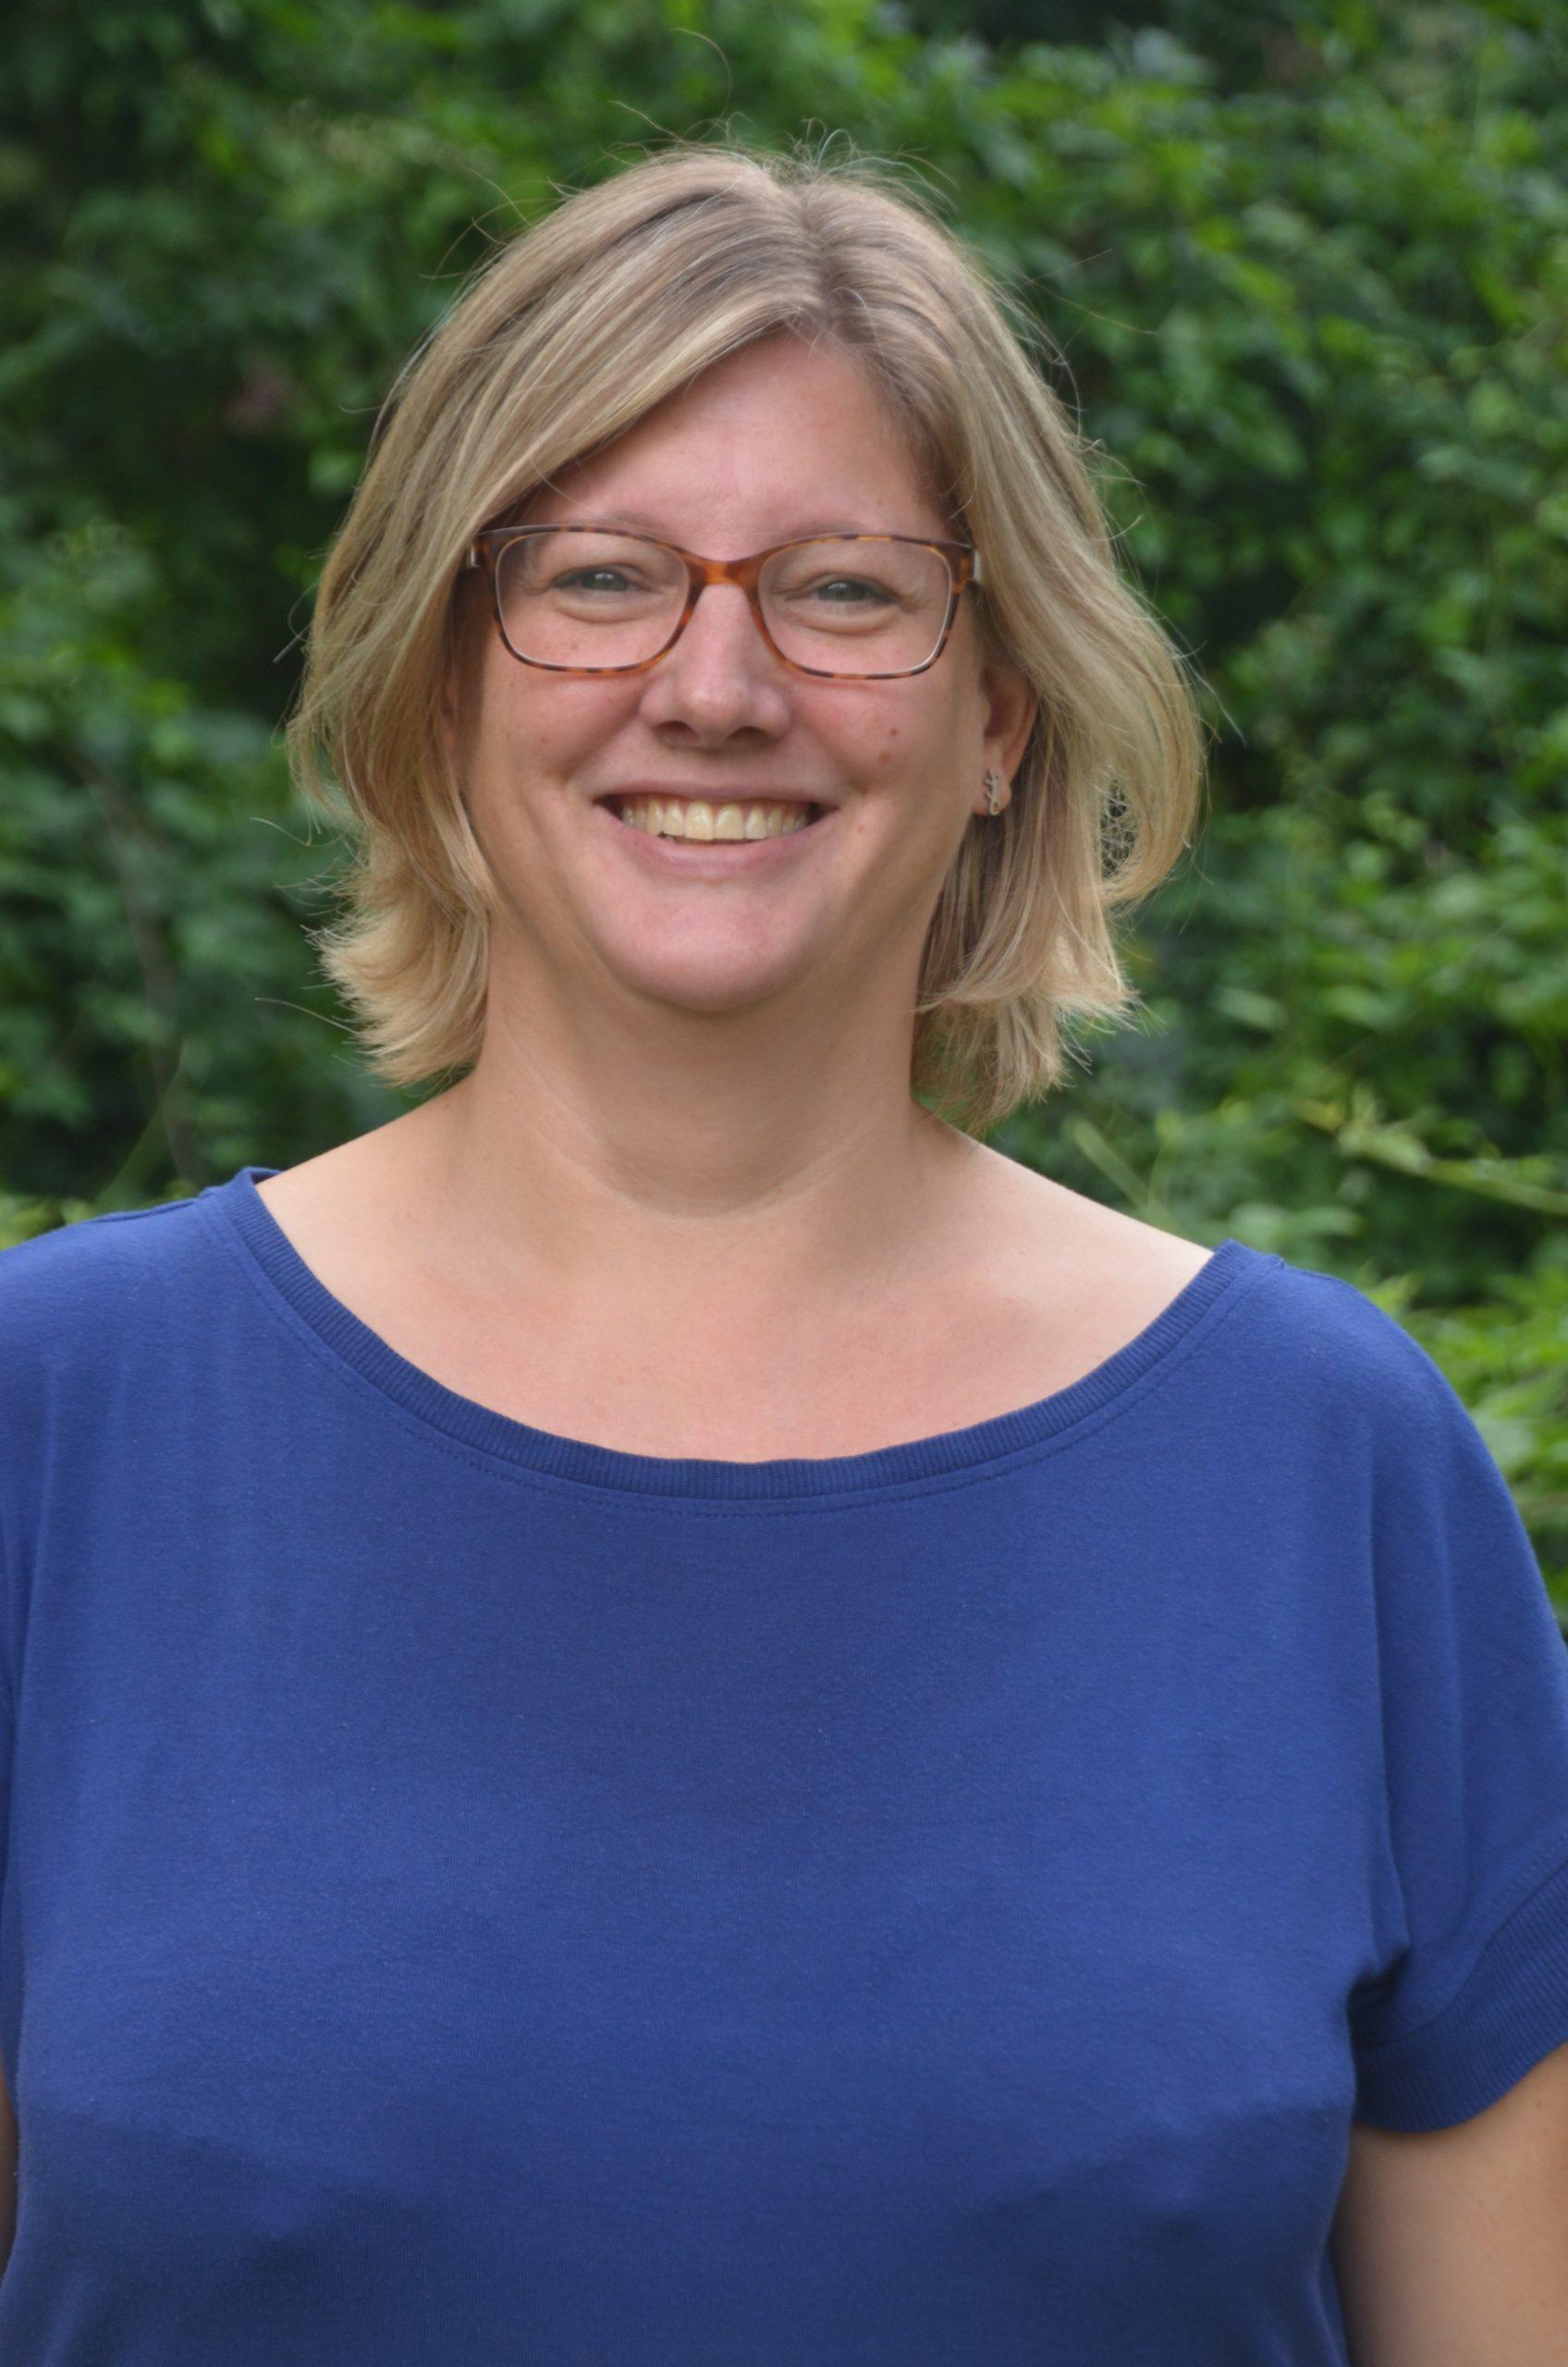 Frau Kreutzberg